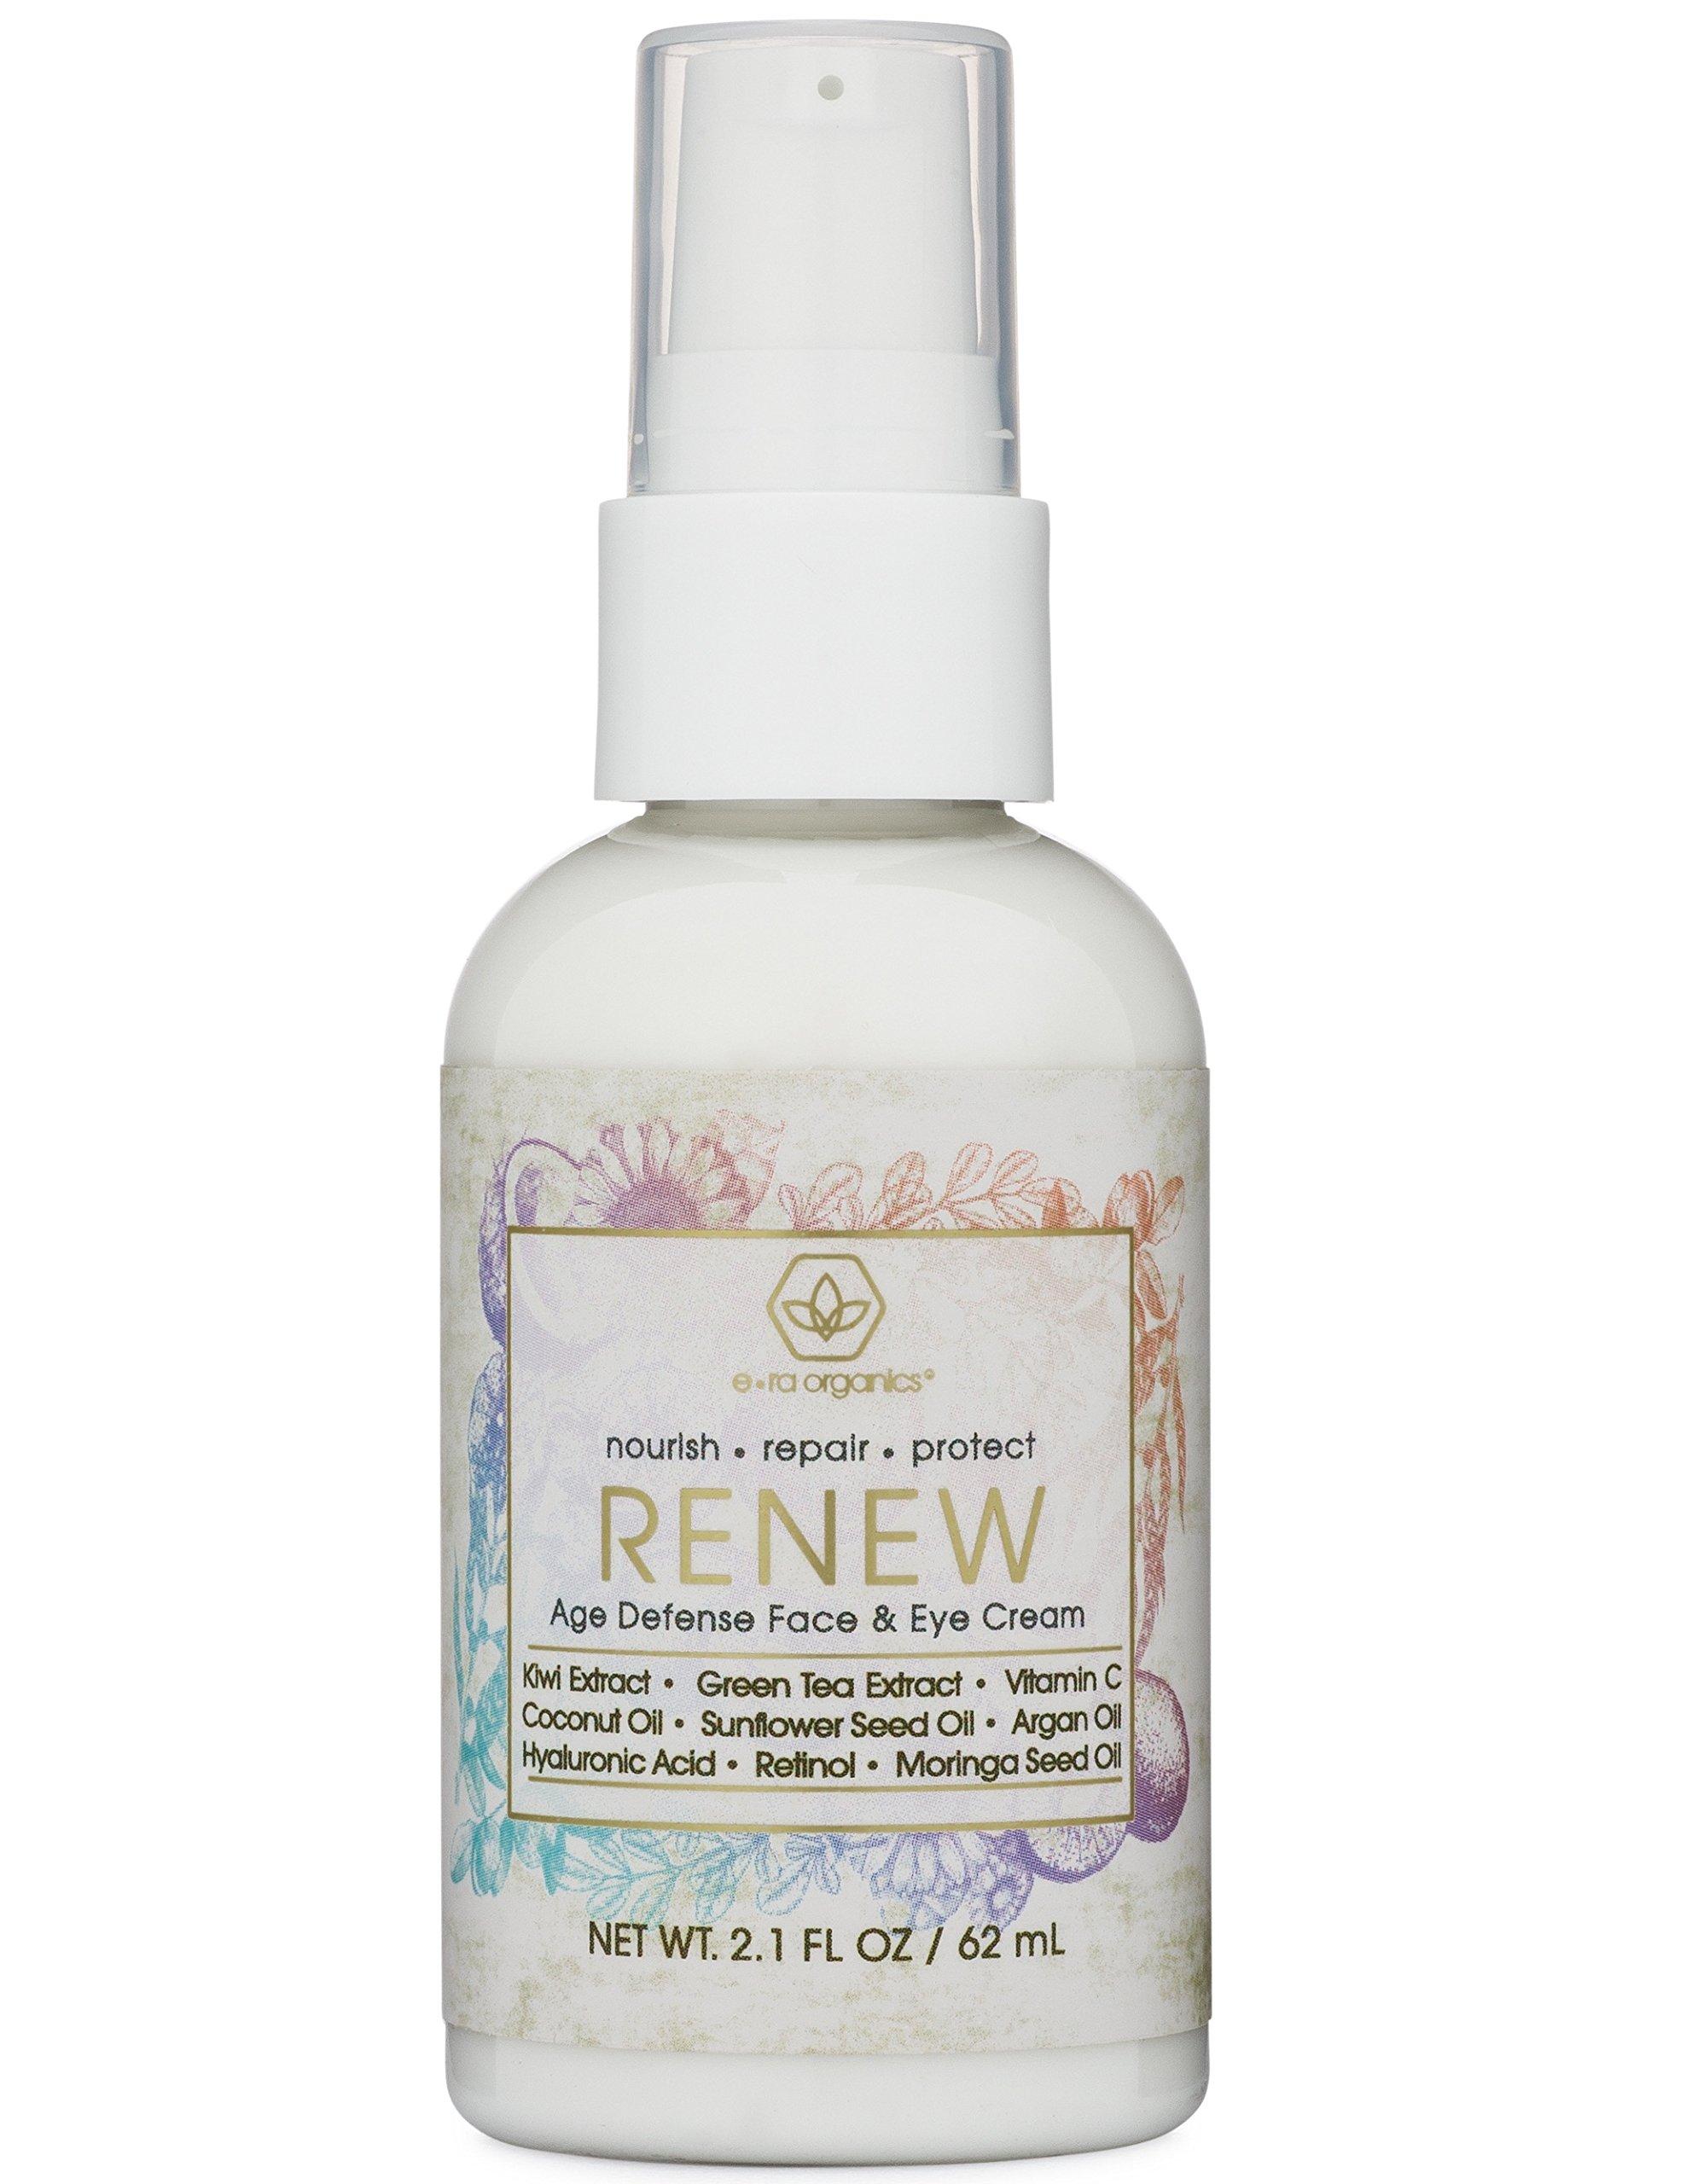 Renew Anti Aging Face And Eye Moisturizer Cream With Hyaluronic Acid, Green Tea & More (2oz.) Natural & Organic Ingredients to Rejuvenate Wrinkles, Crows Feet, Under Eye Bags Dark Circles